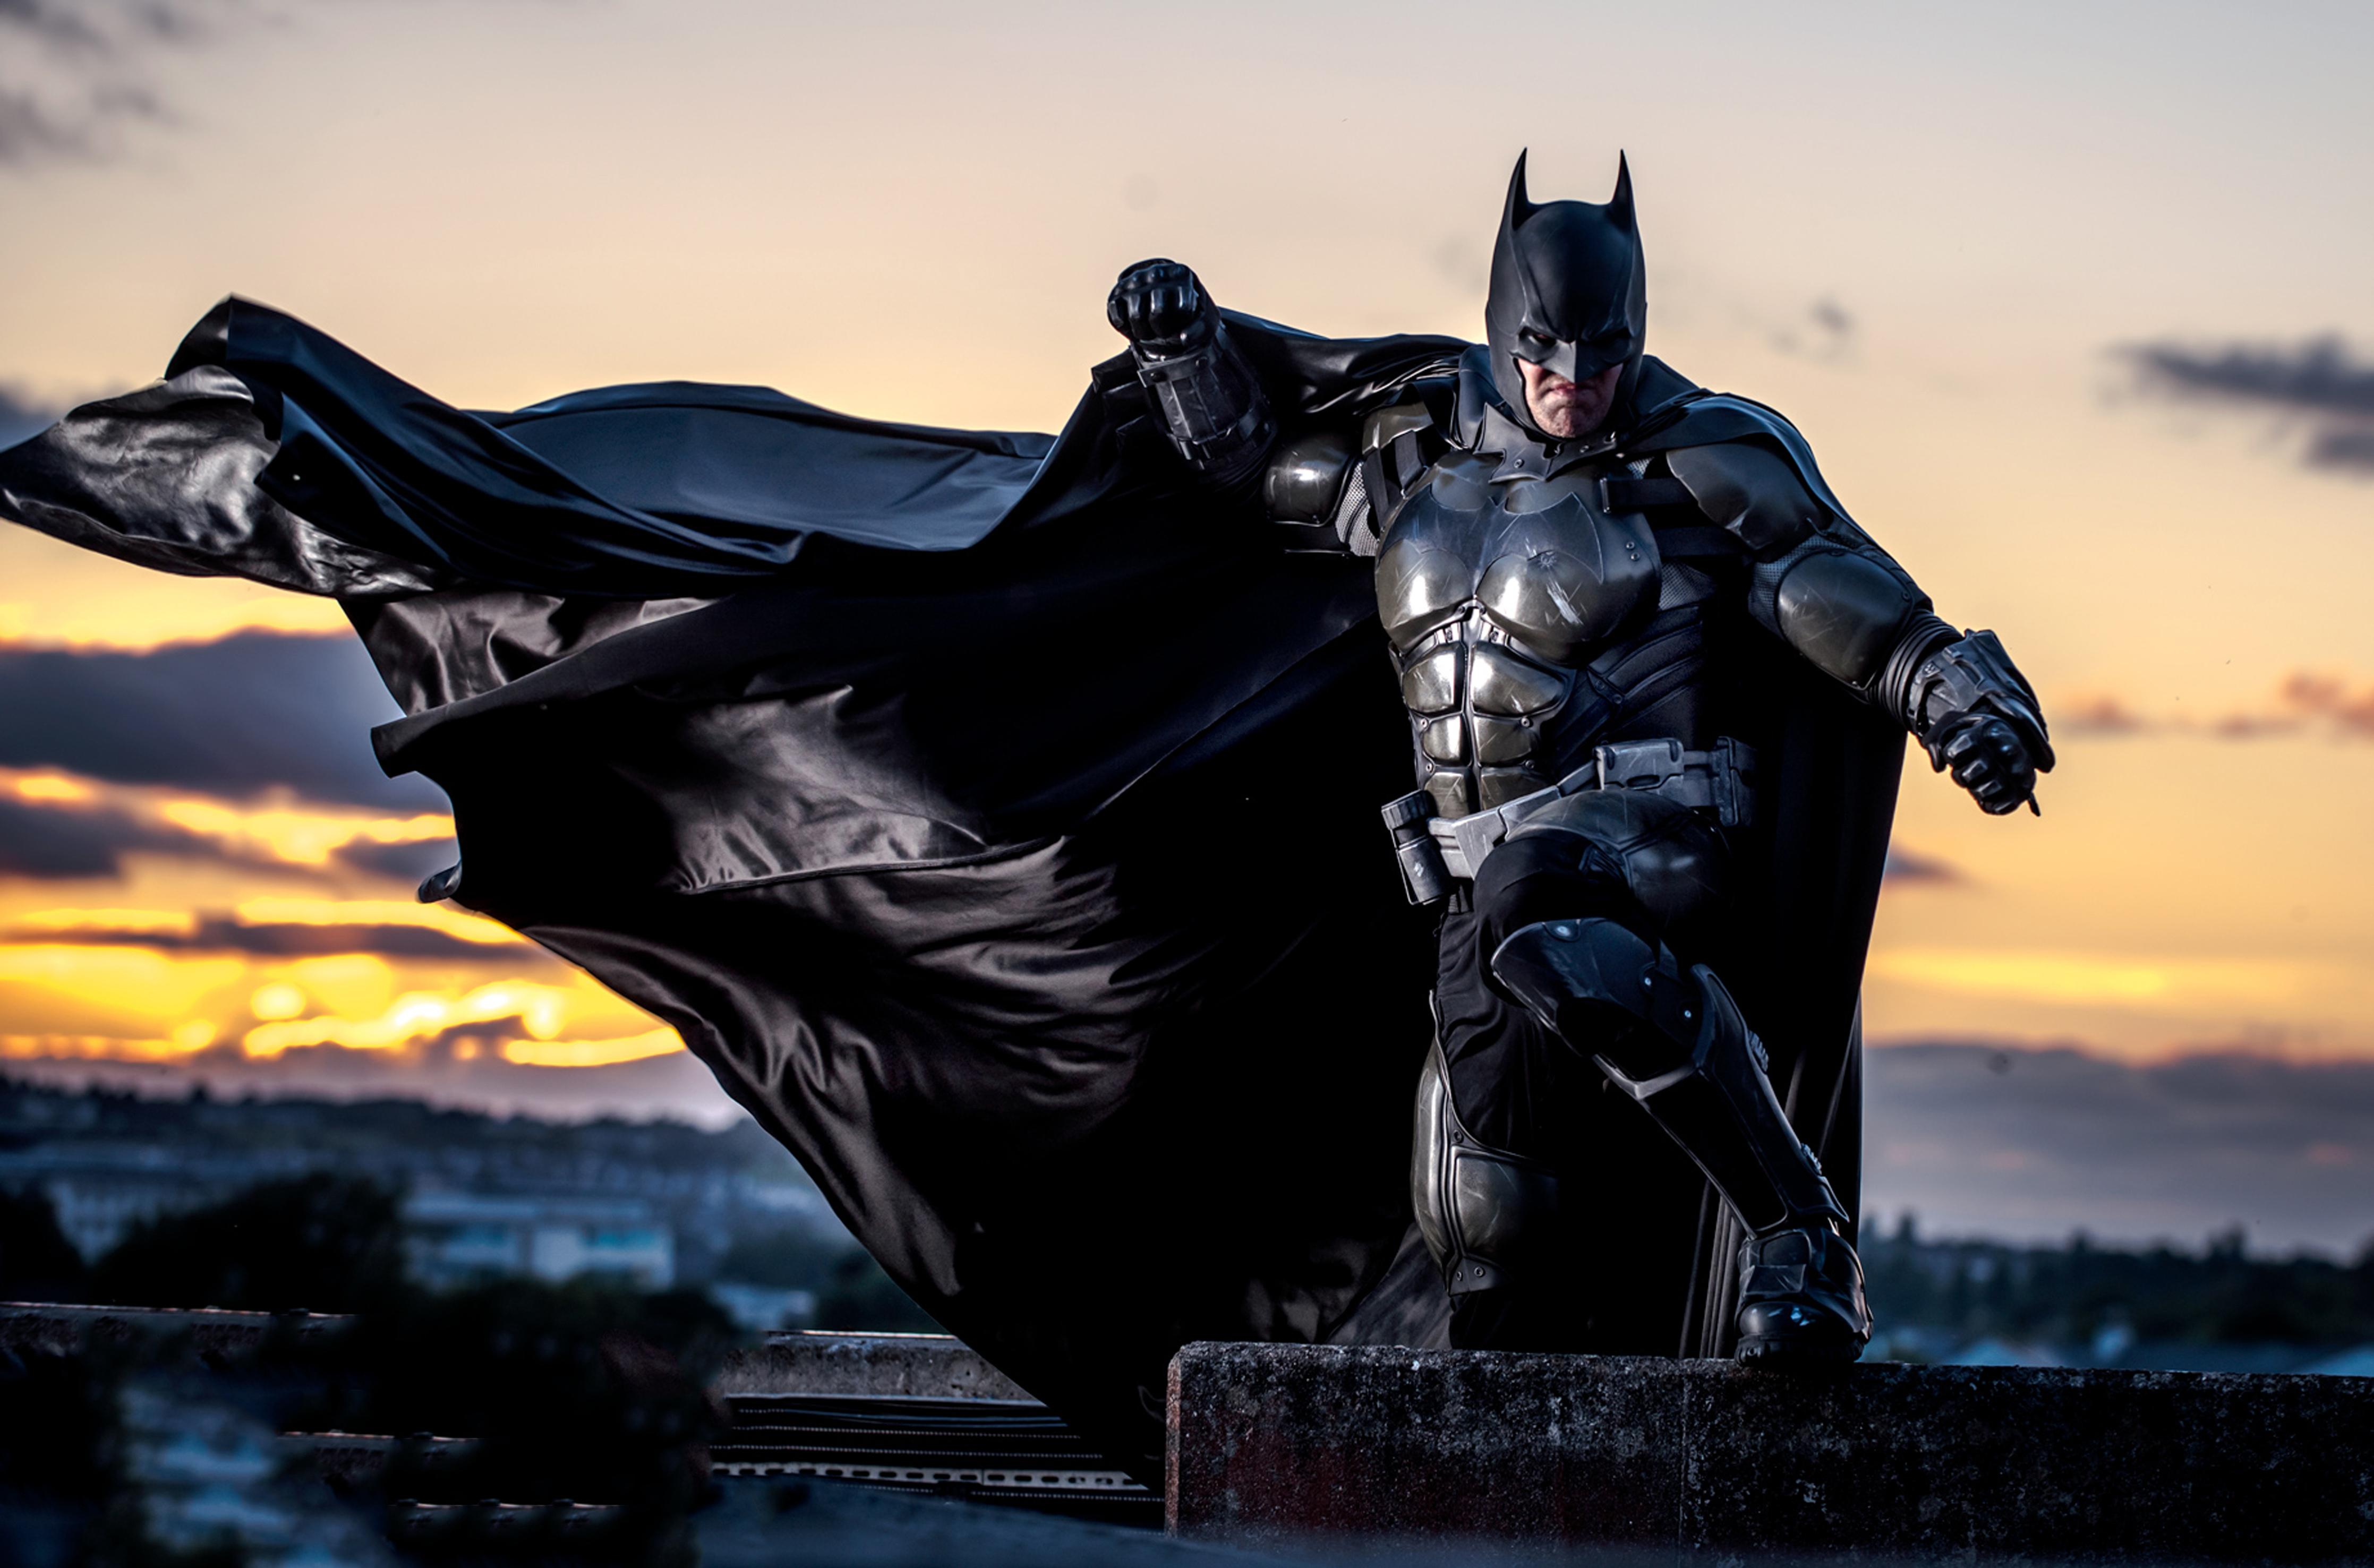 batman cosplay 1581355487 - Batman Cosplay - Batman Cosplay wallpapers, Batman Cosplay 4k wallpapers, Batman Cosplay 4k